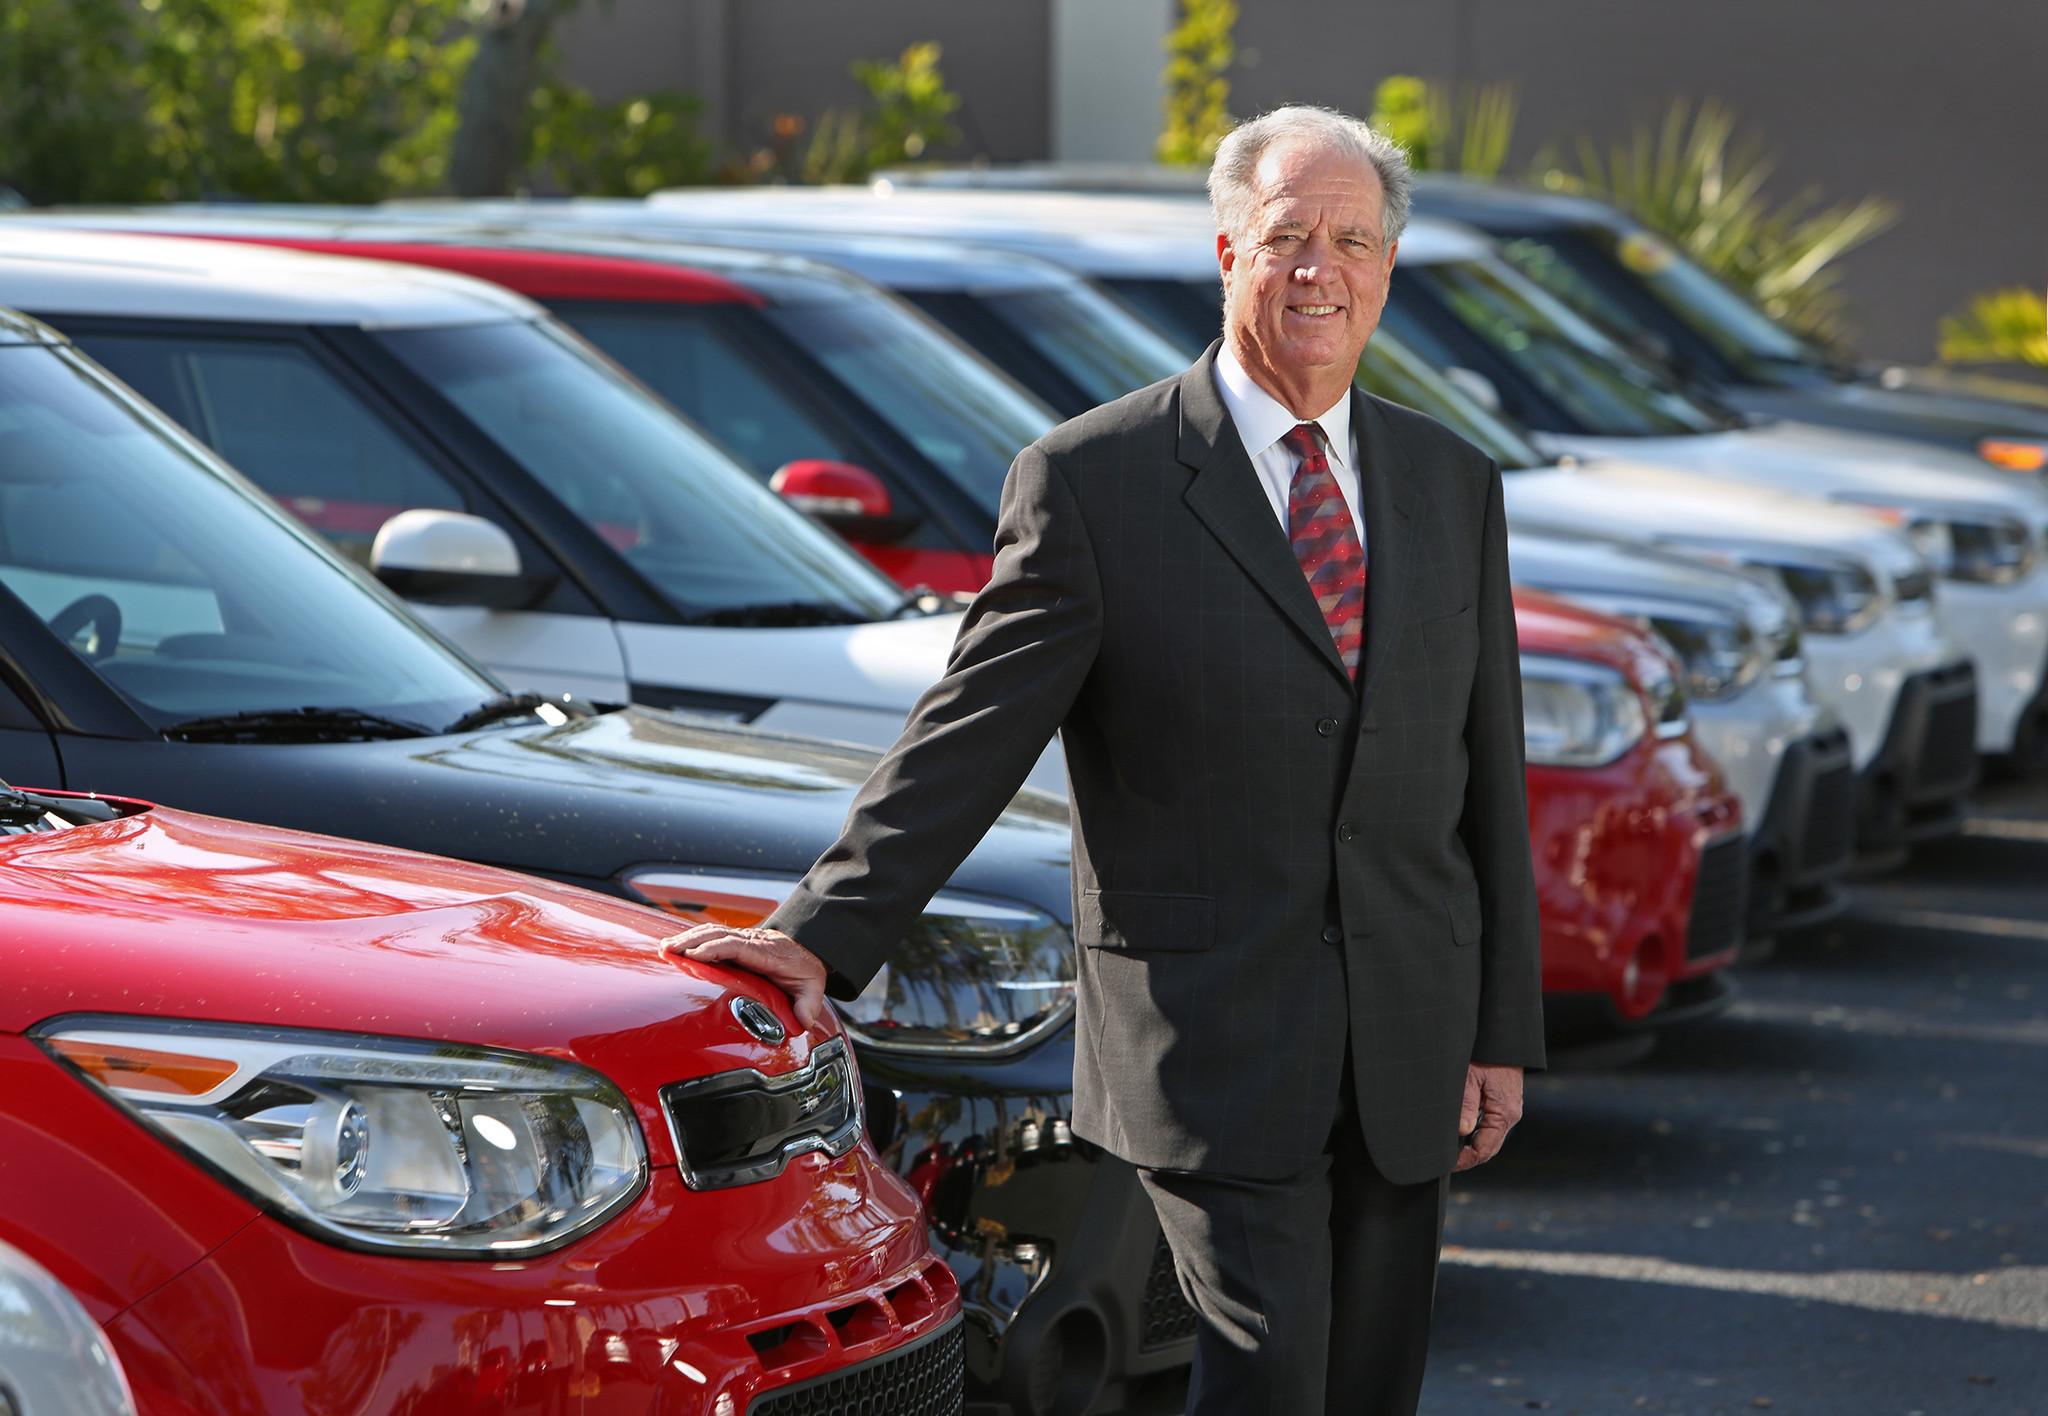 Phil smith auto group investing 9 million in store upgrades sun sentinel